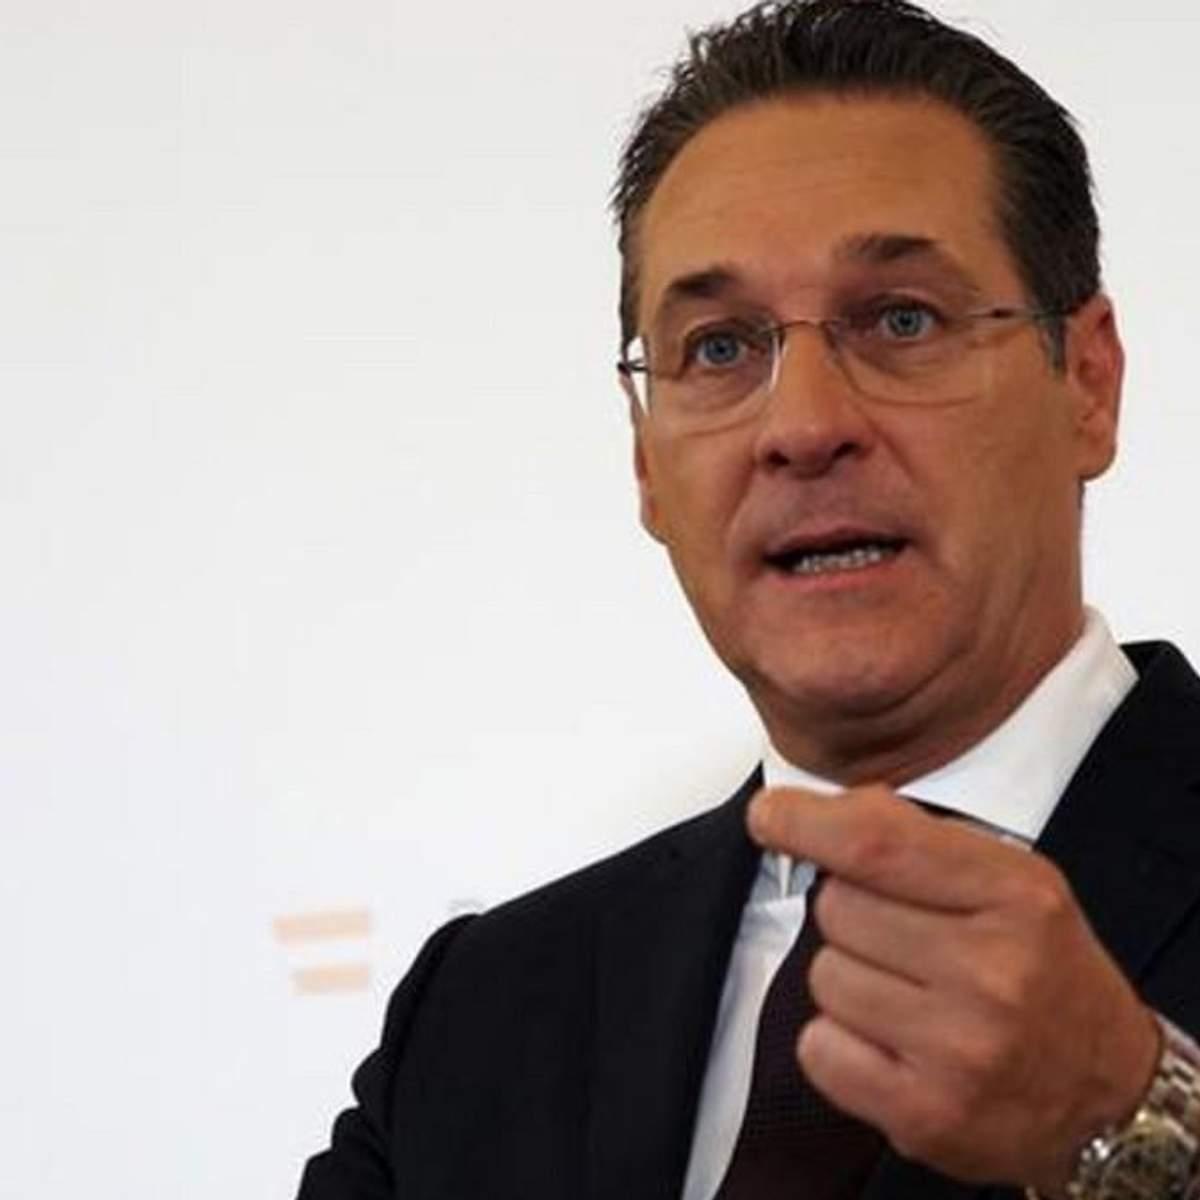 Ексвицеканцлера Австрии будут судить за вероятную взятку 10 тисяч евро